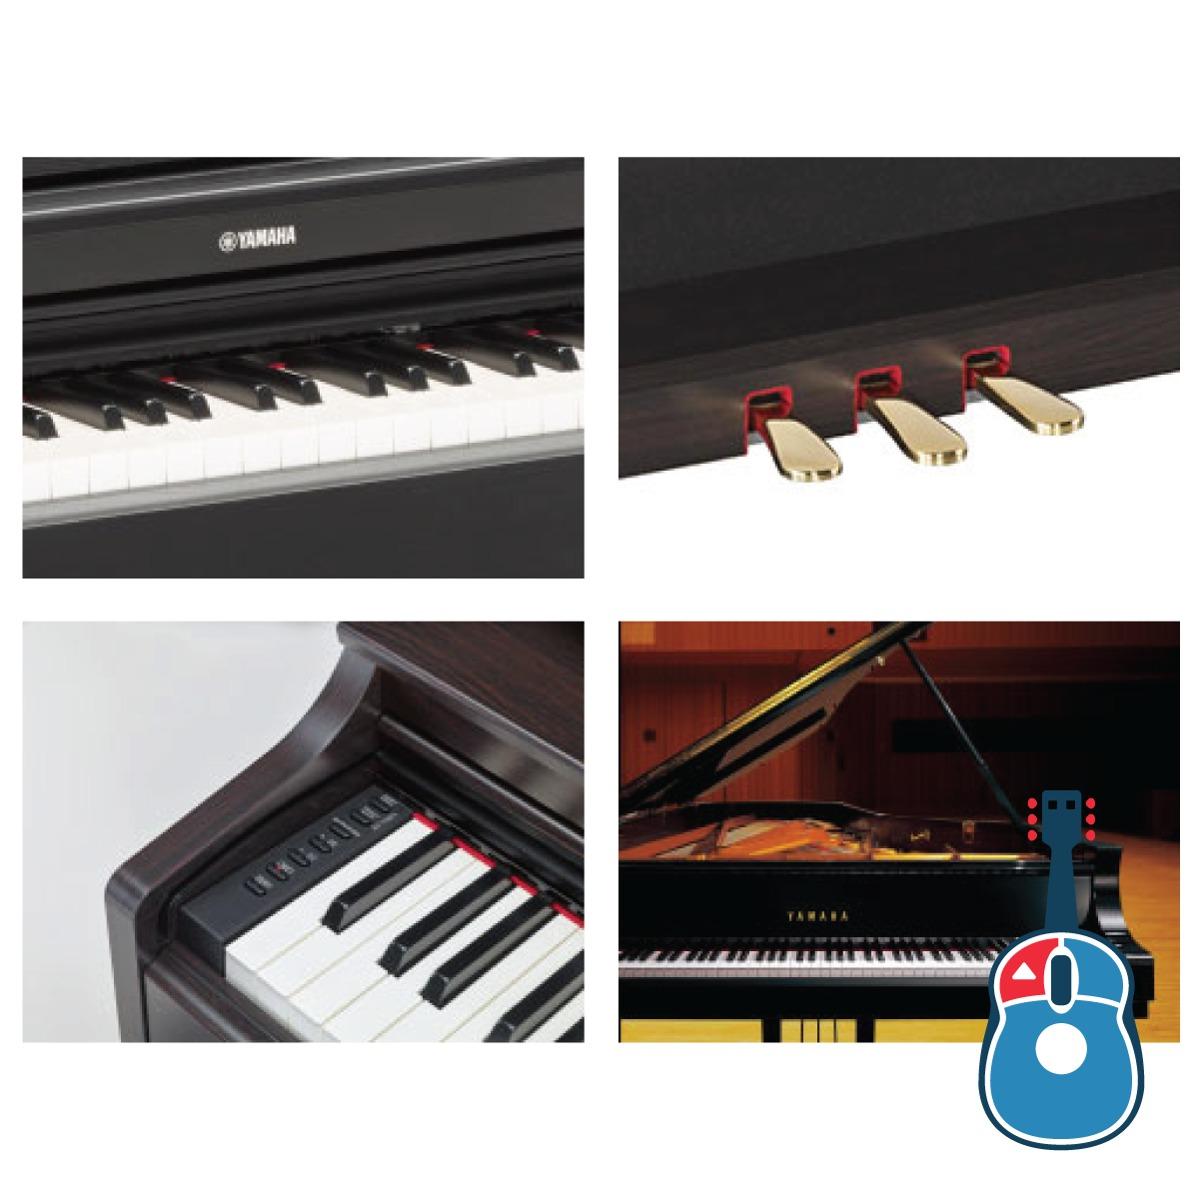 piano digital yamaha arius ydp163 r banqueta bc108 dr r em mercado livre. Black Bedroom Furniture Sets. Home Design Ideas